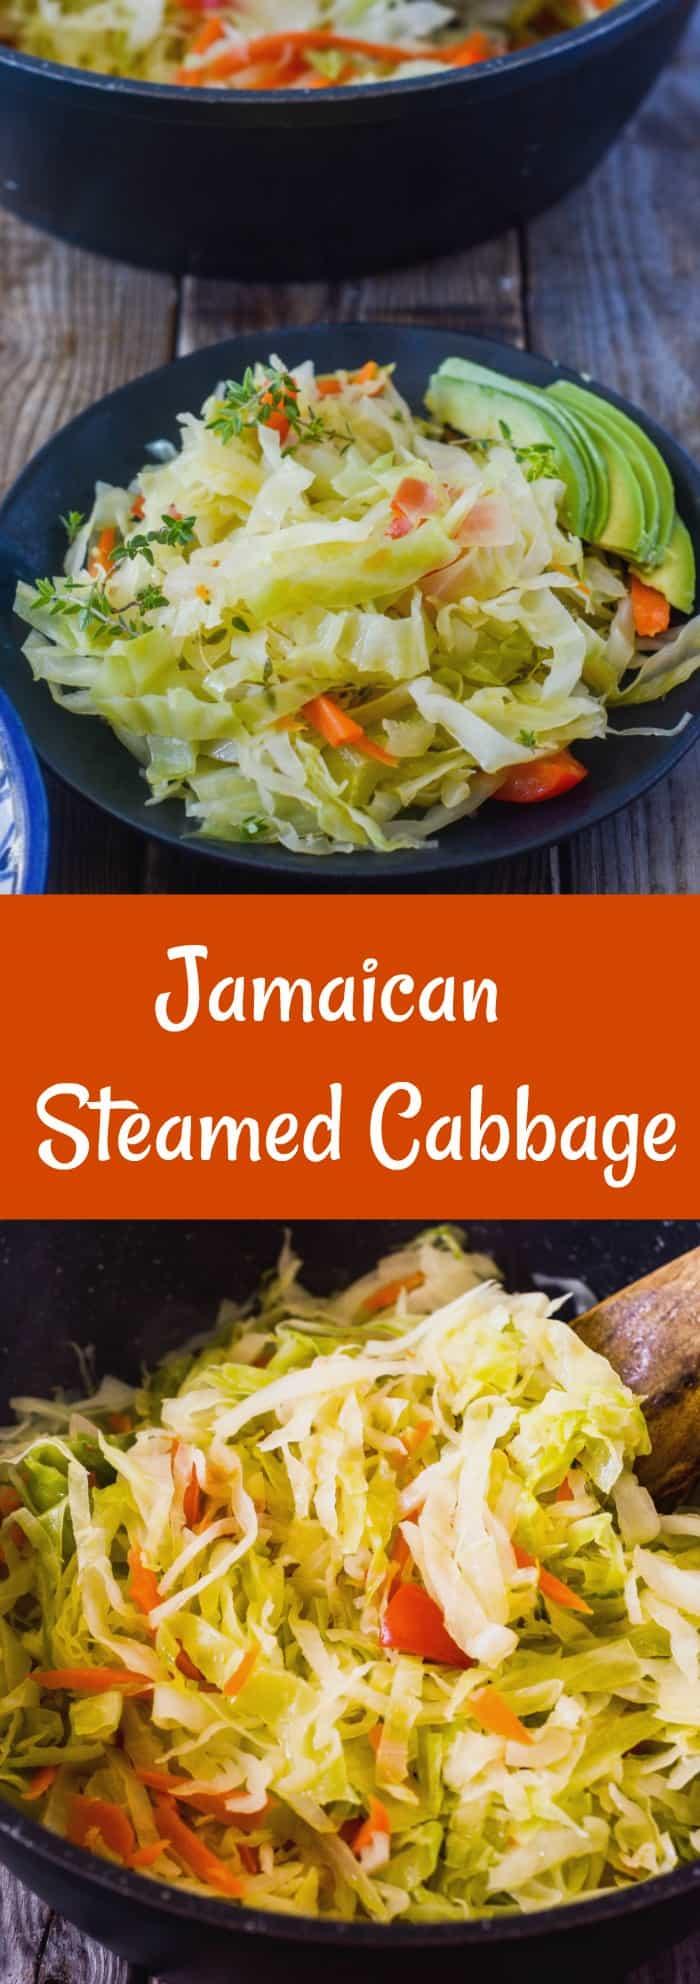 Jamaican Steamed Cabbage